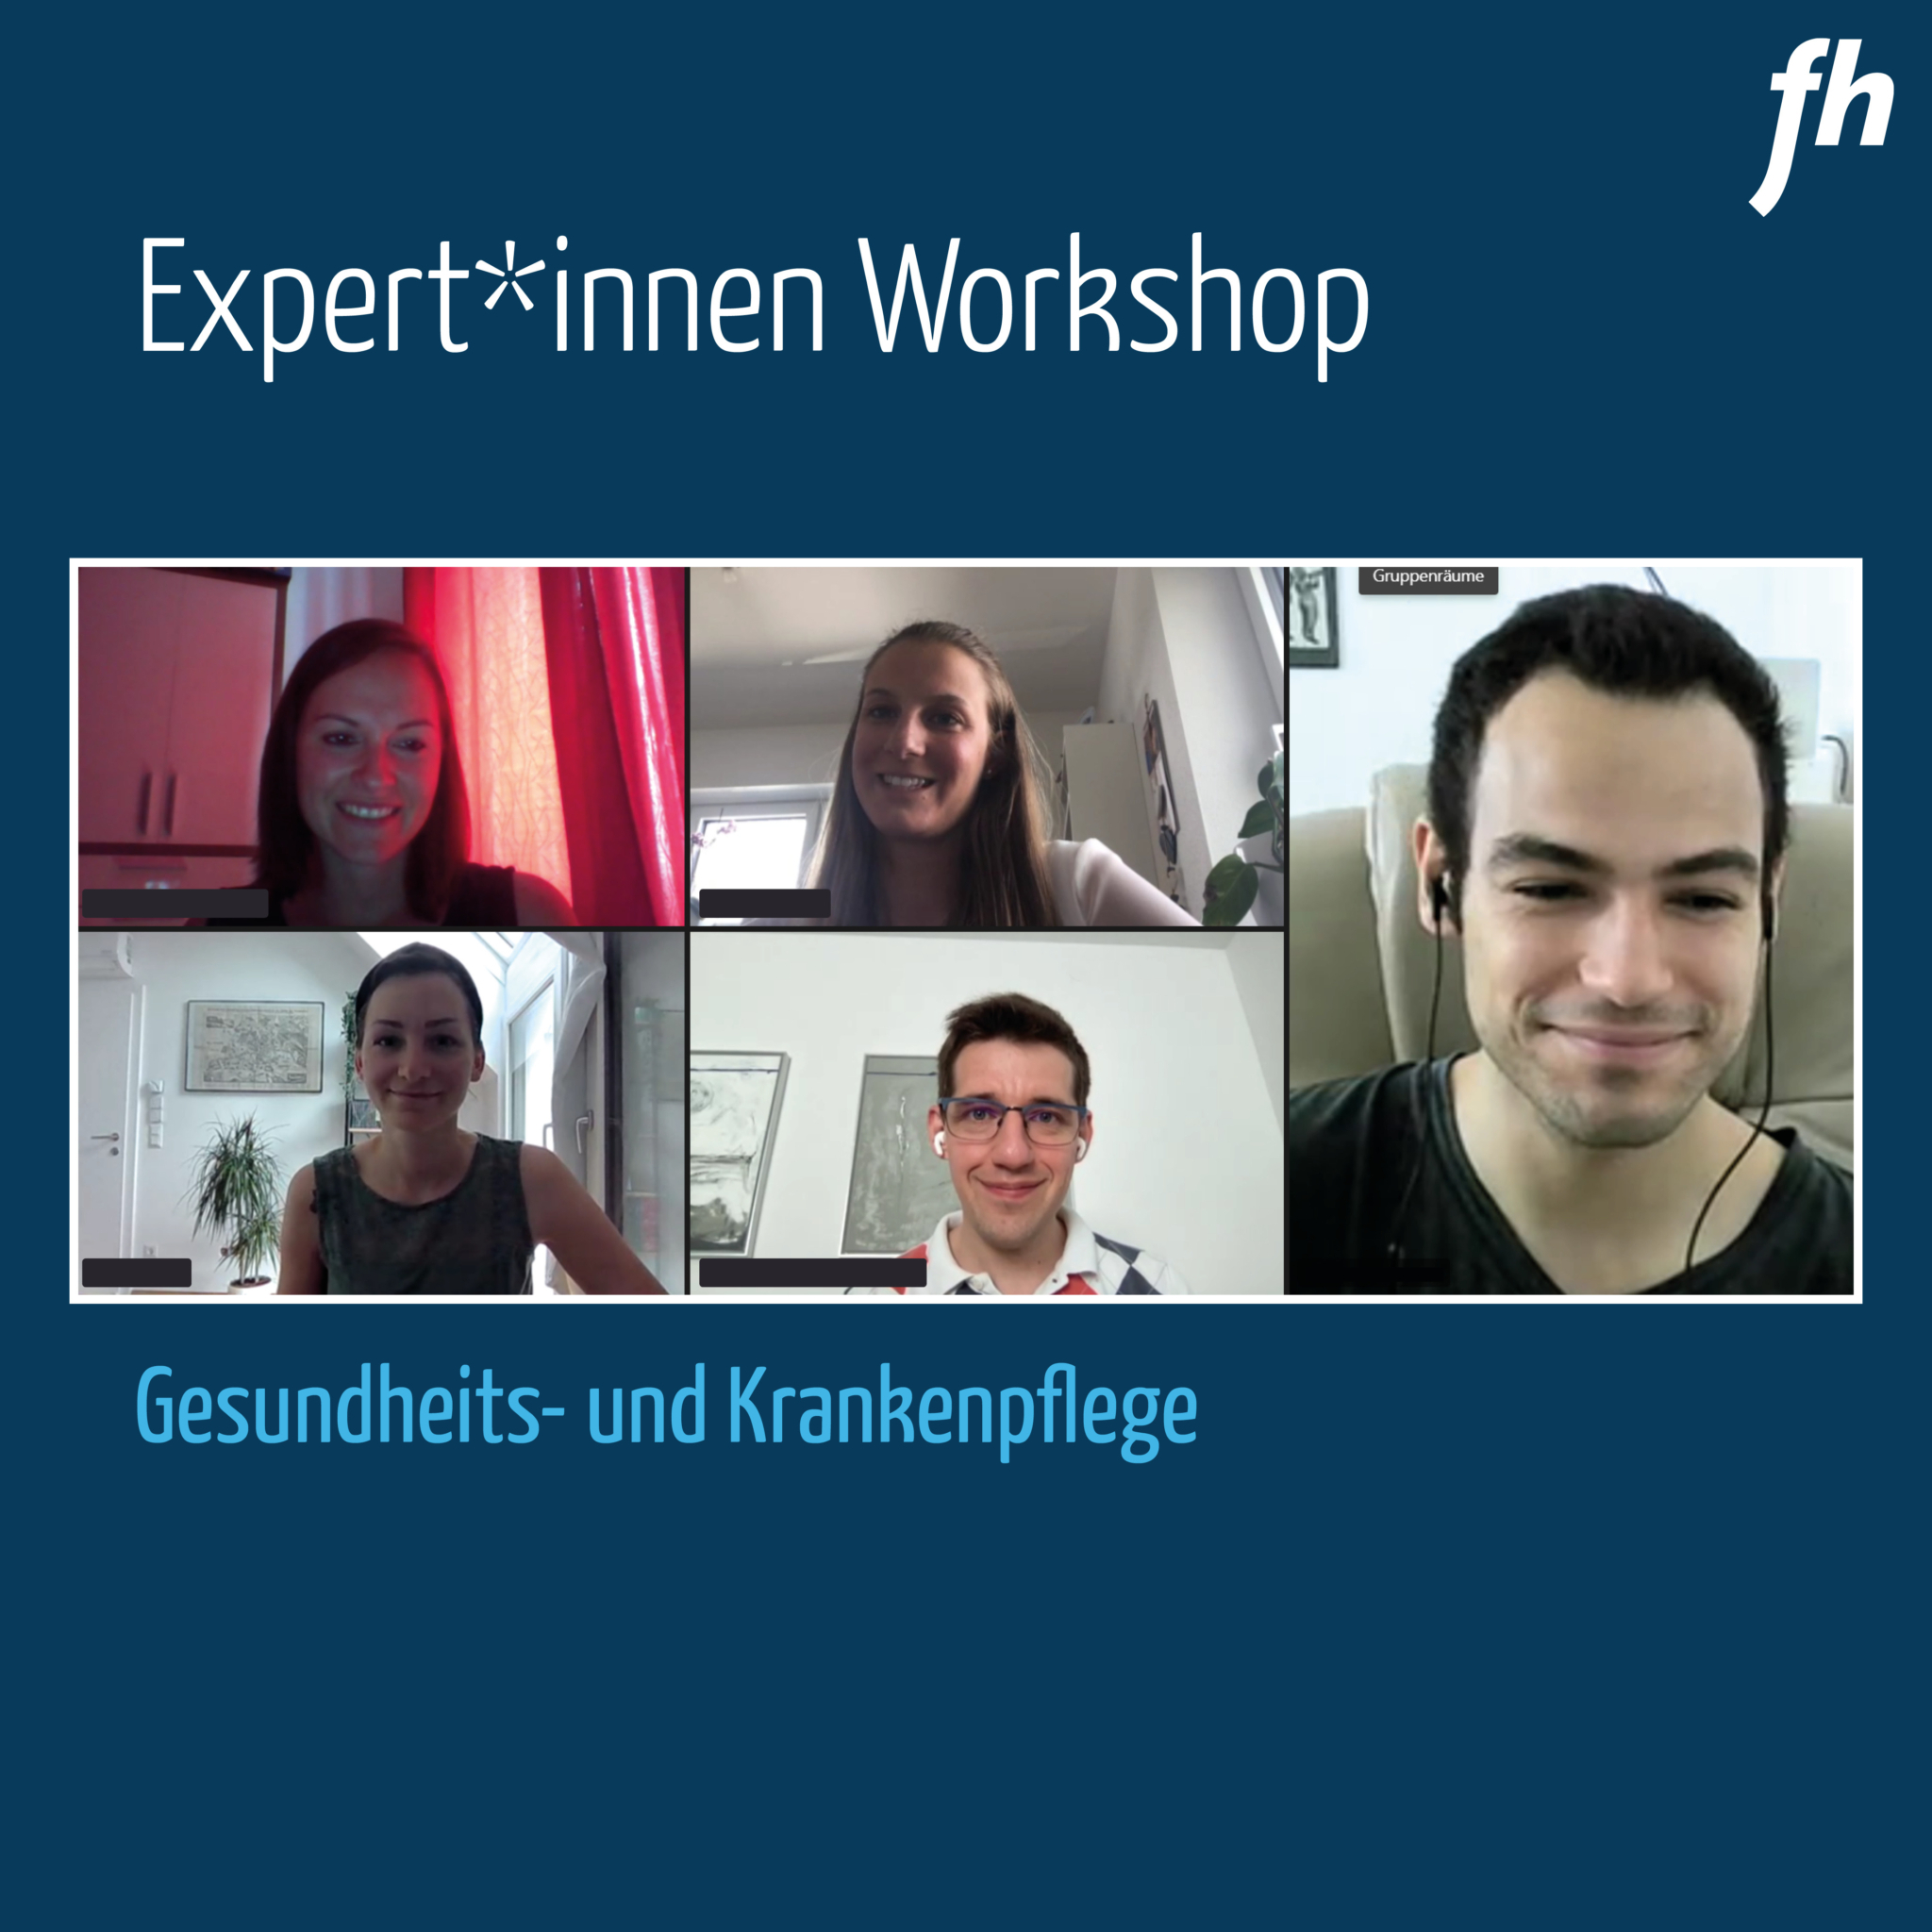 Expert*innenworkshop am Studiengang Gesundheits- und Krankenpflege (Credit: FH Gesundheitsberufe OÖ)